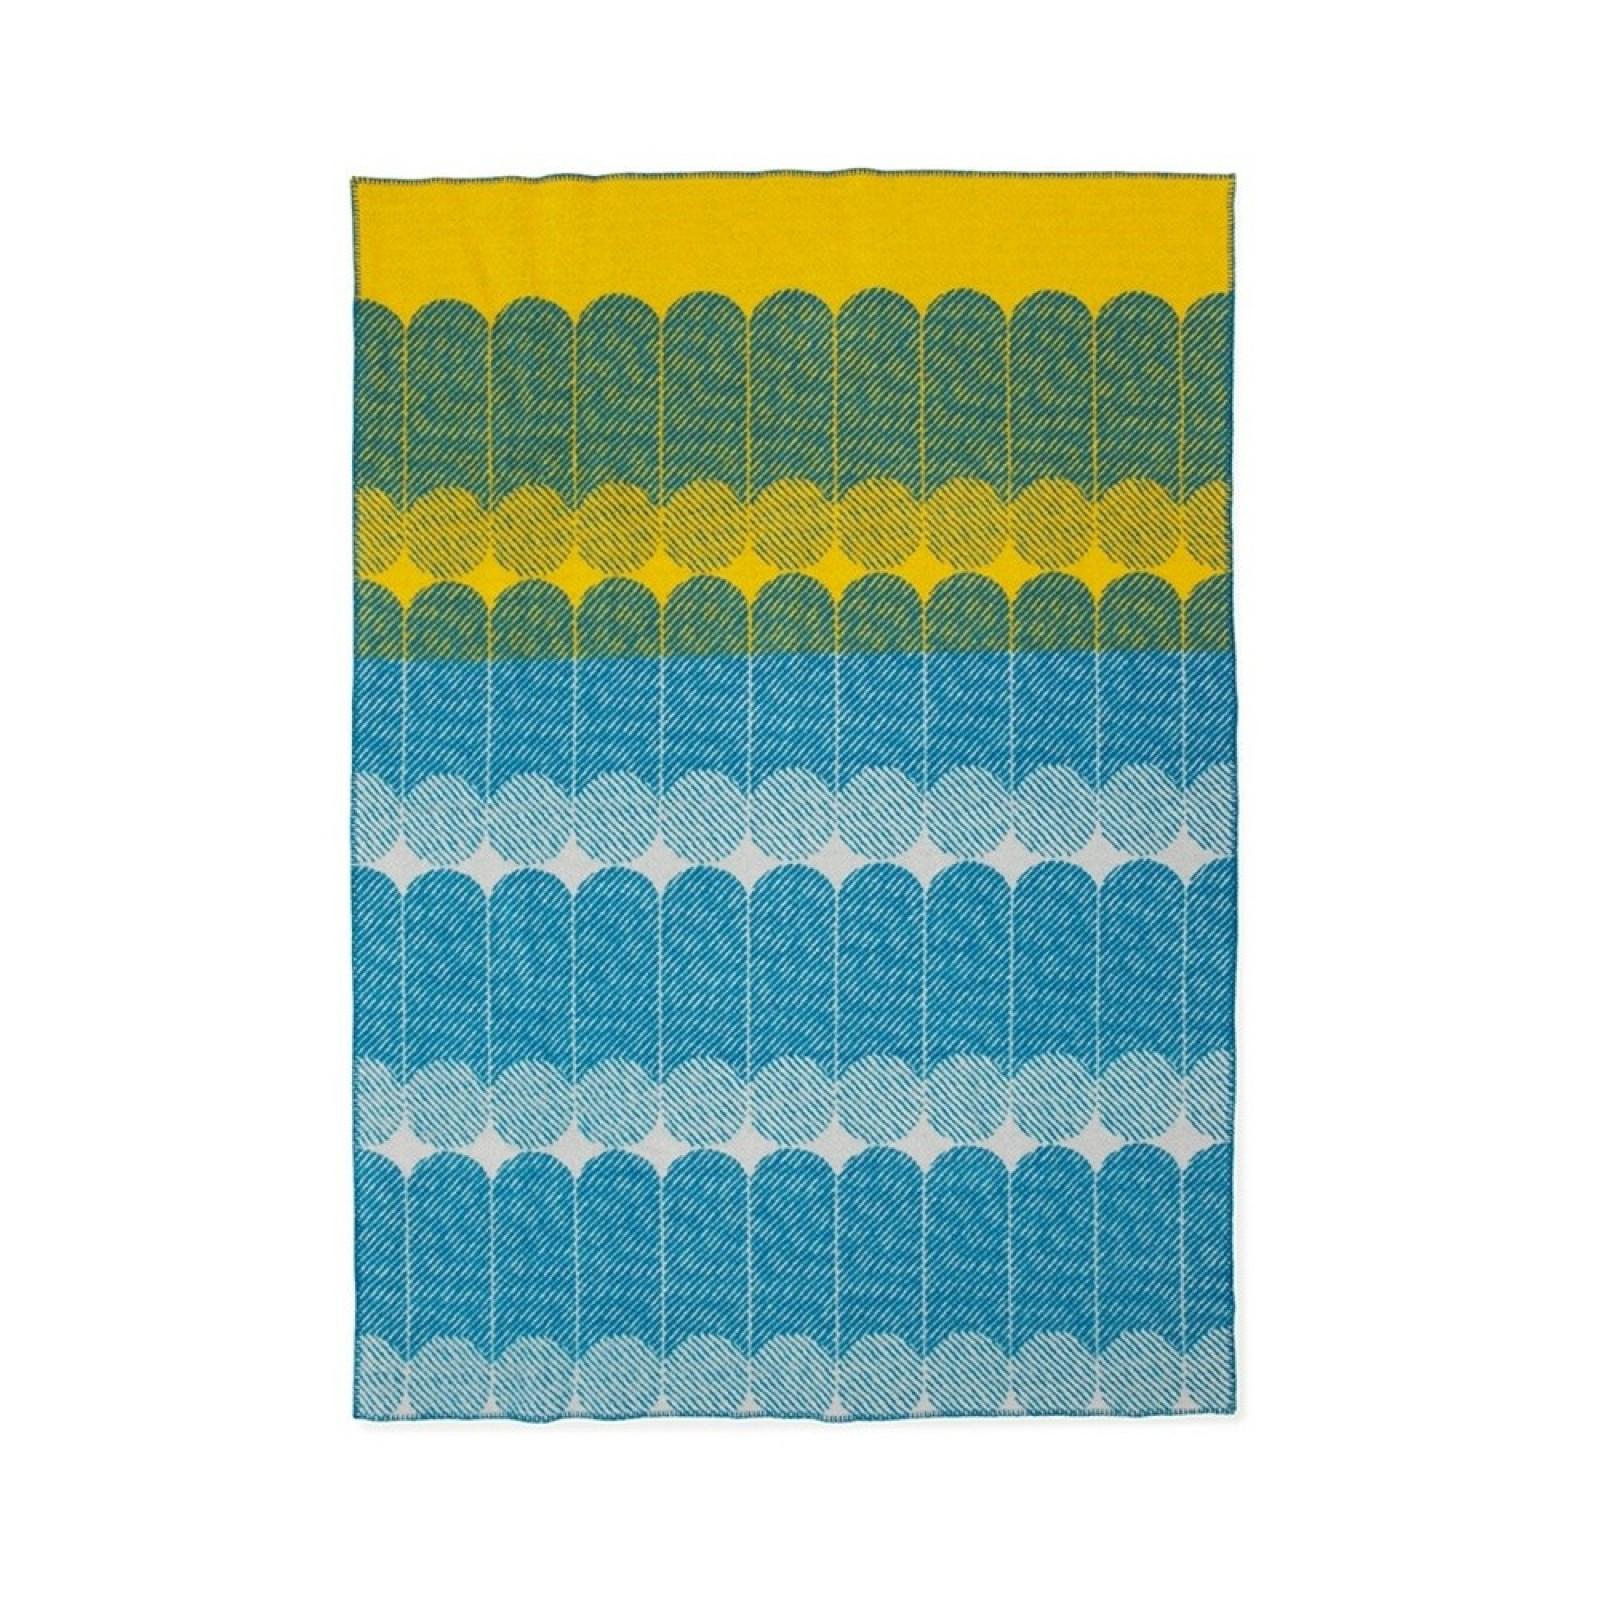 Ekko Throw Blanket (Yellow & Dusty Blue) - Normann Copenhagen